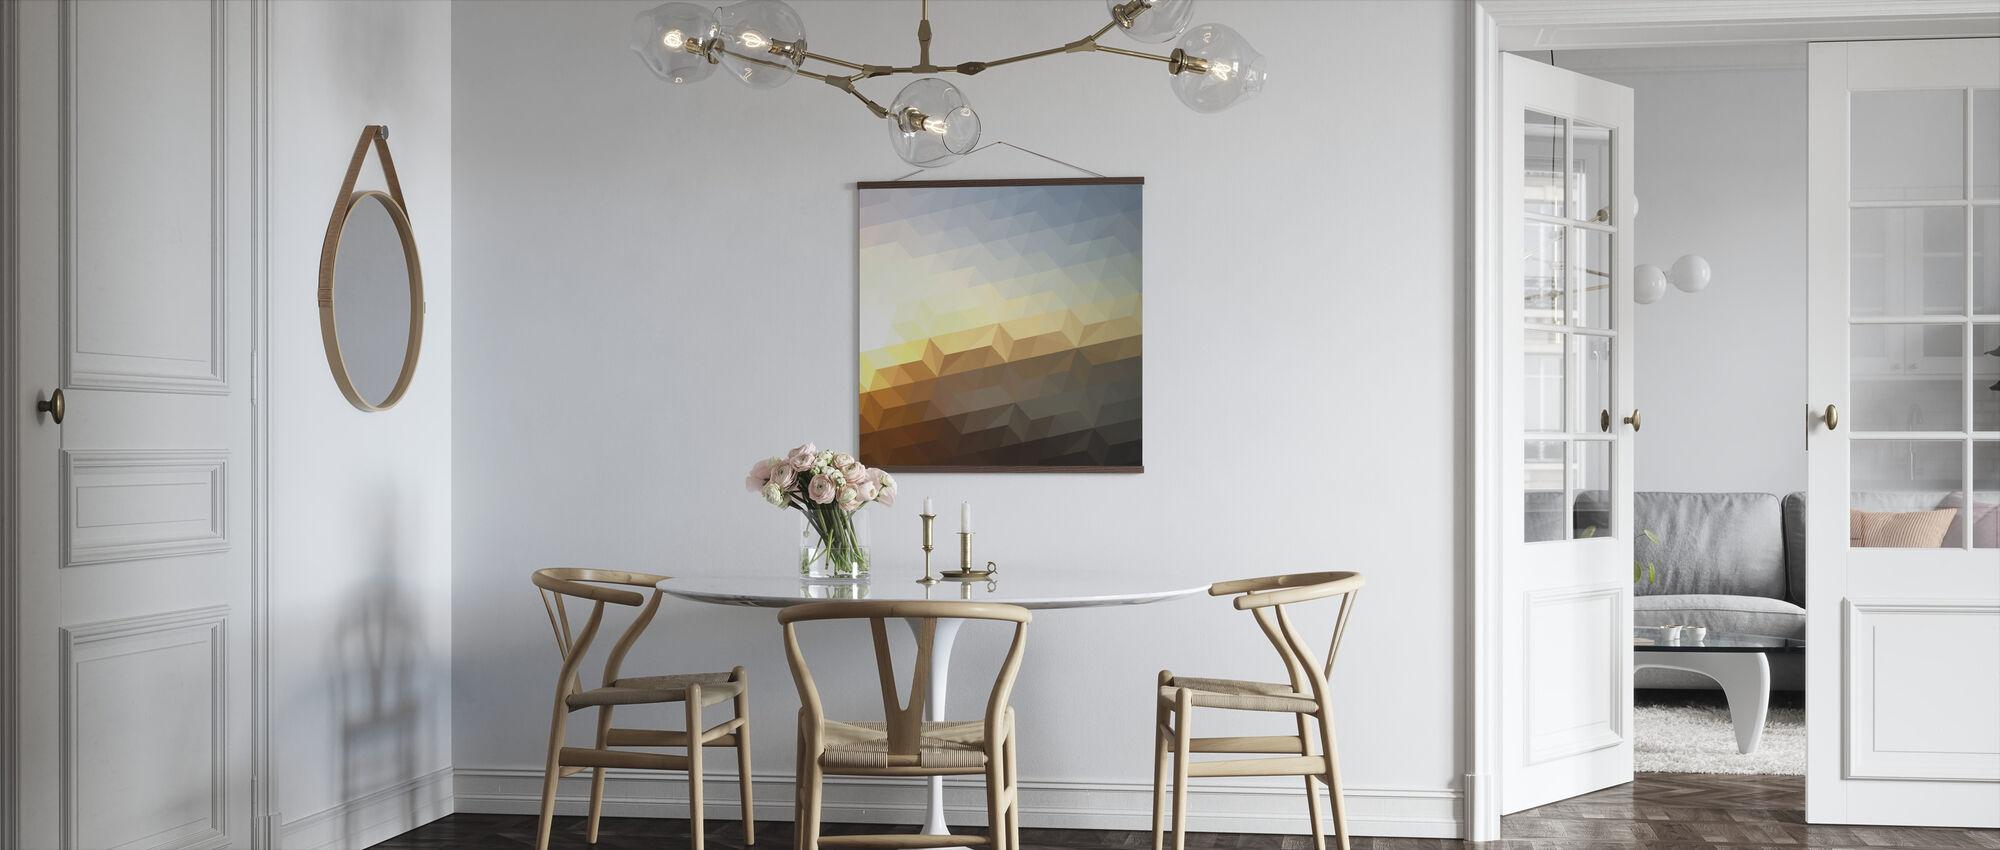 Abstrakti auringonlasku - Juliste - Keittiö